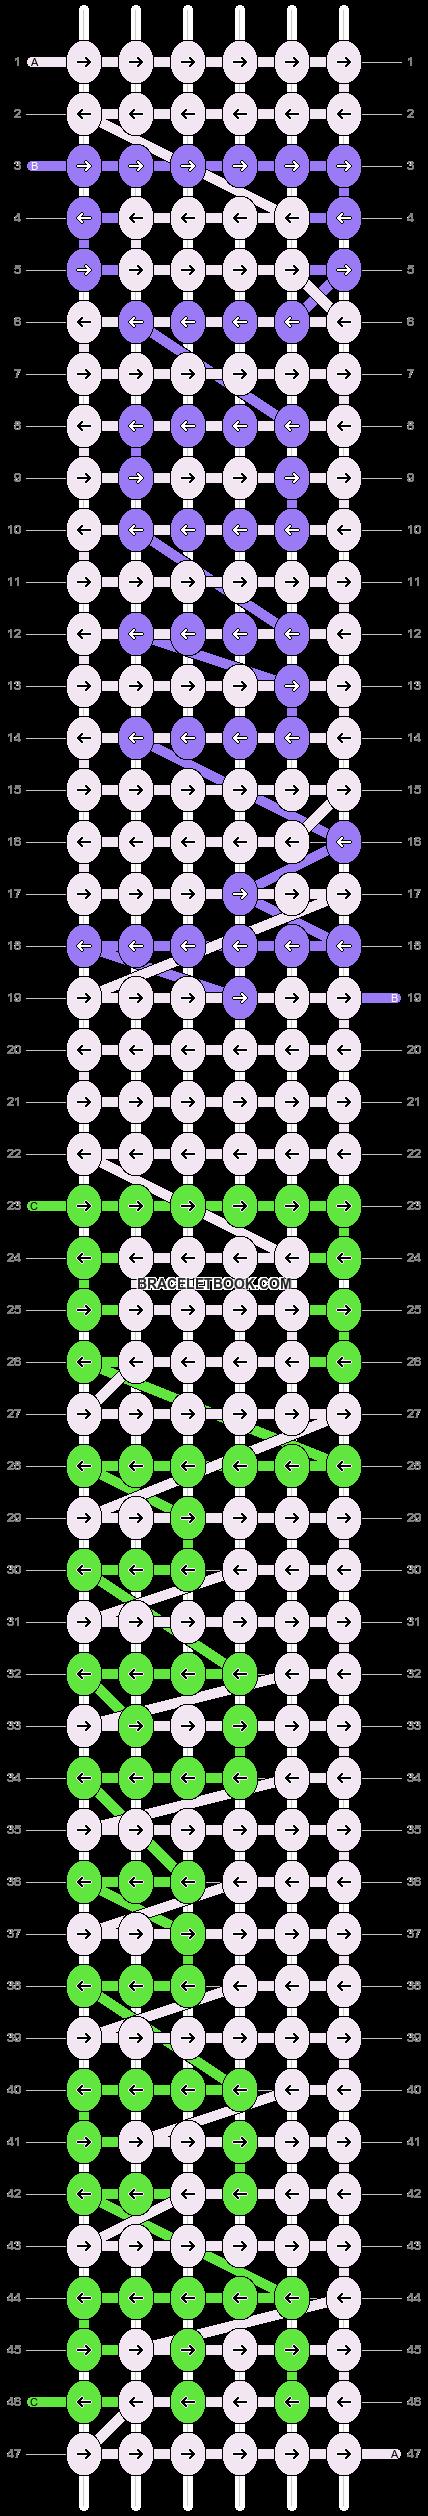 Alpha pattern #7104 pattern